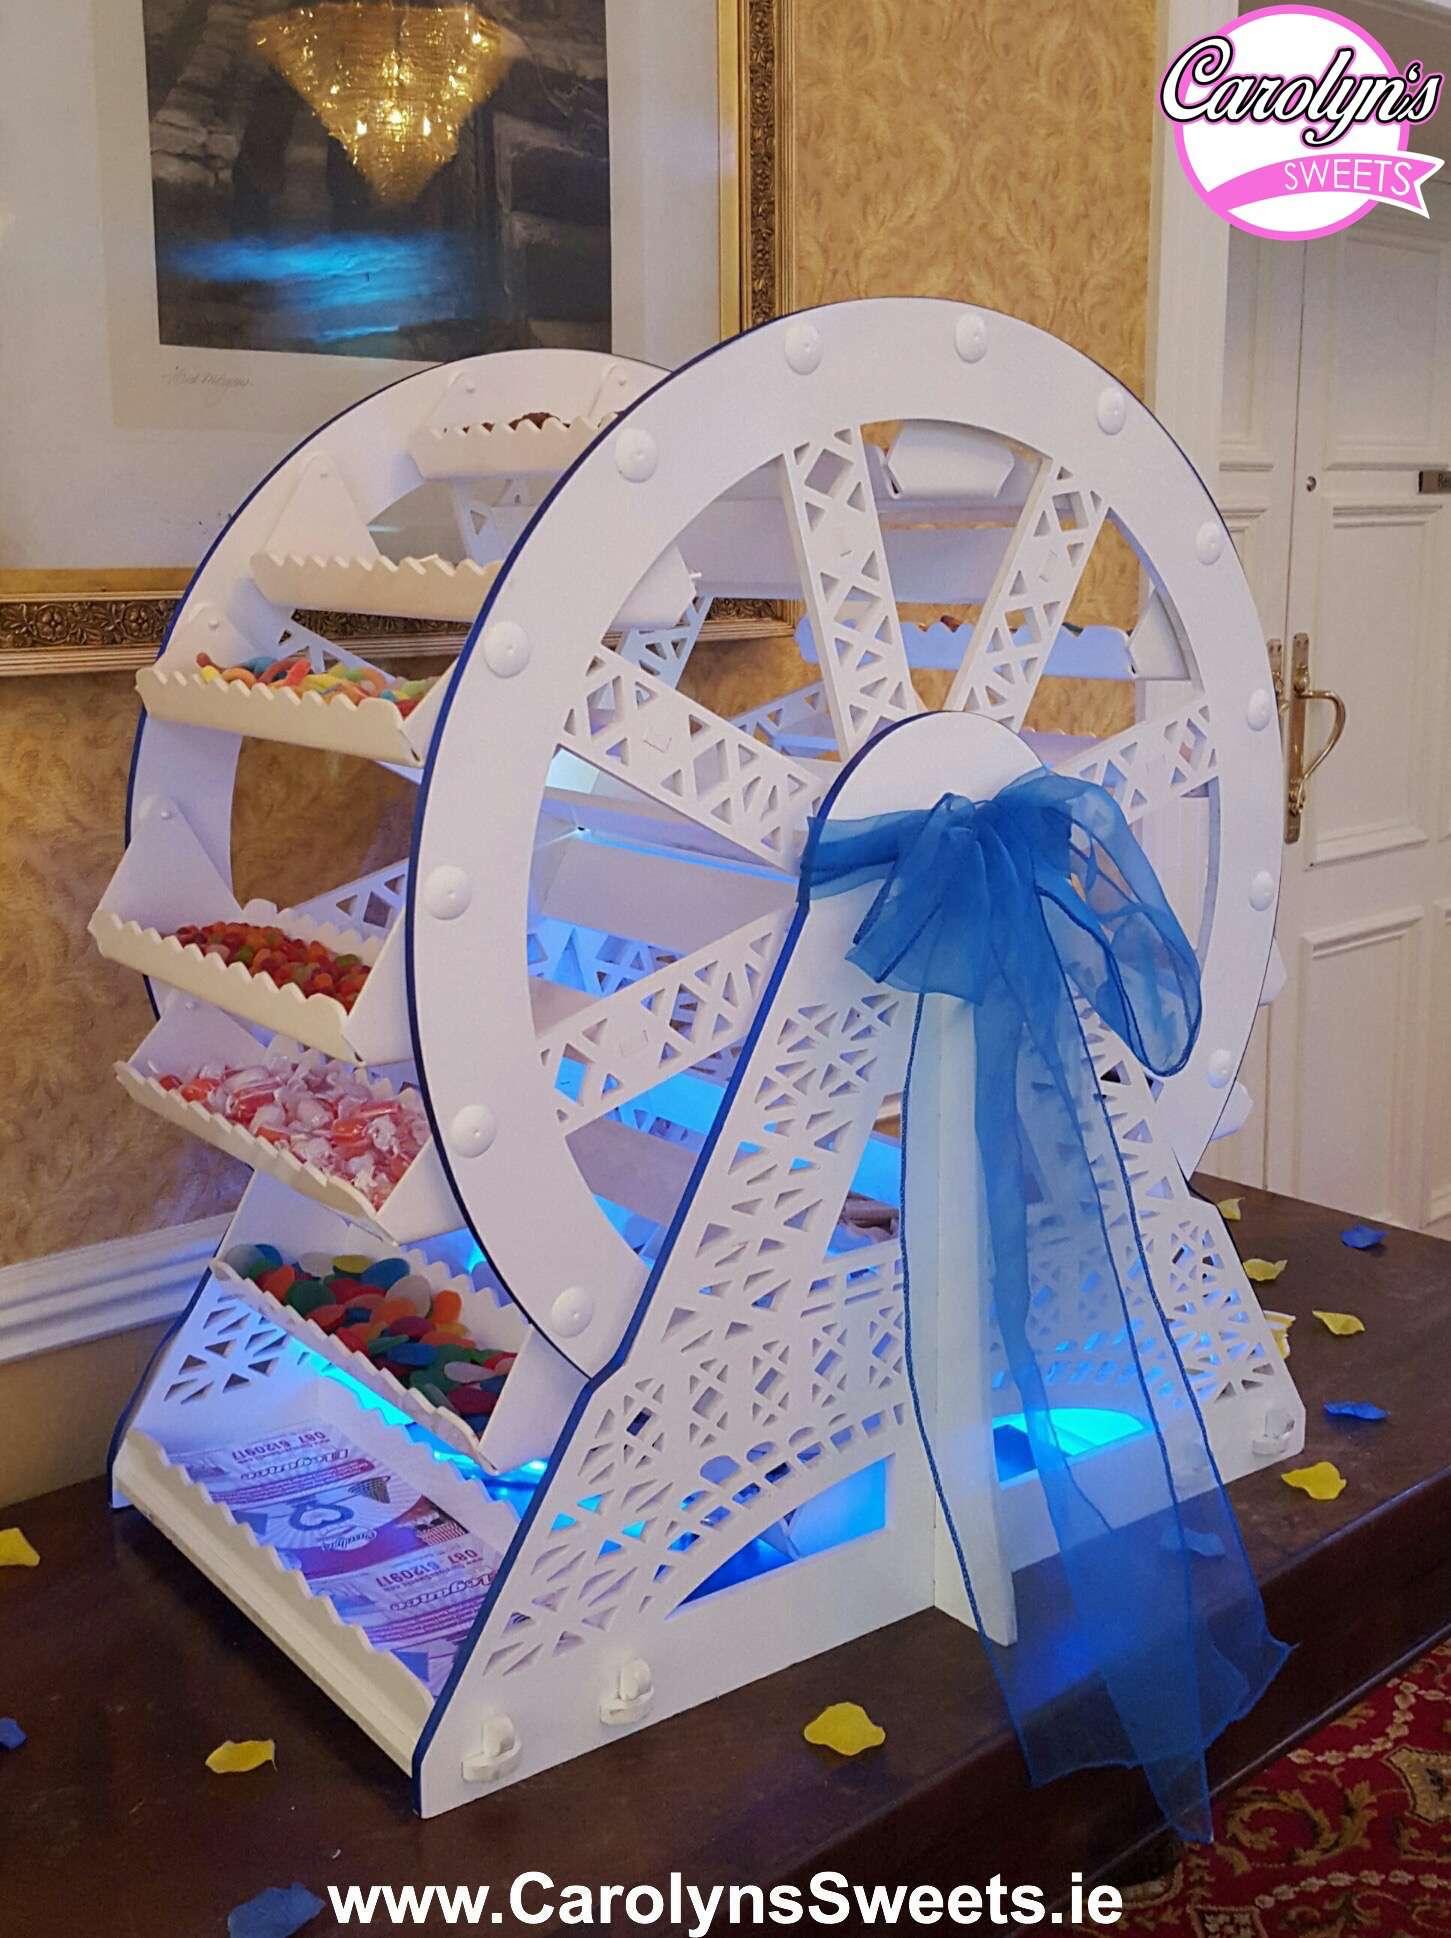 Candy Ferris Wheel Hire2 2